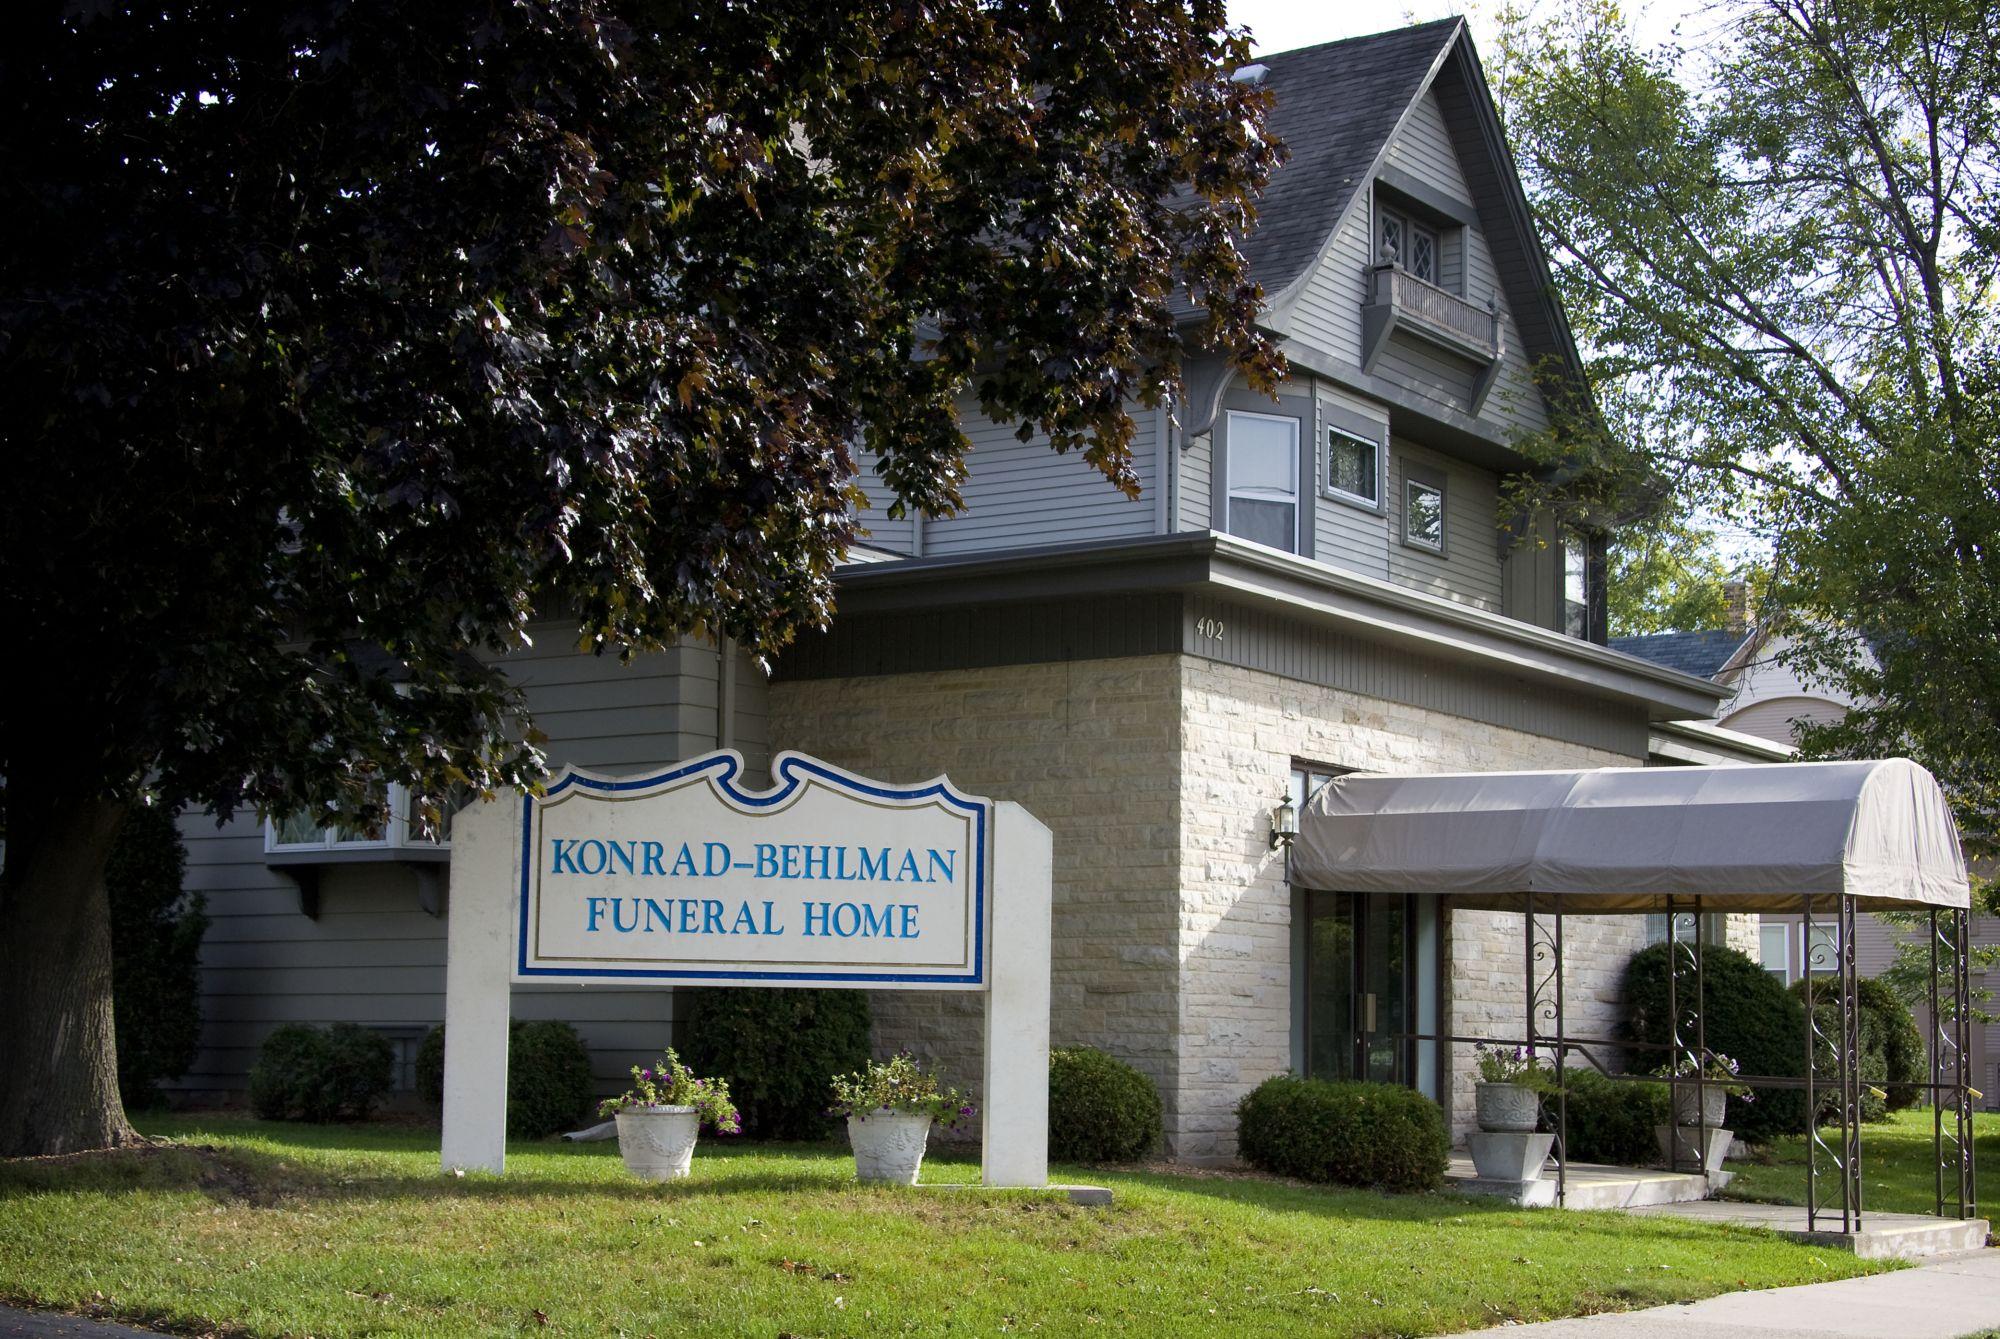 Konrad Behlman Funeral home image 6